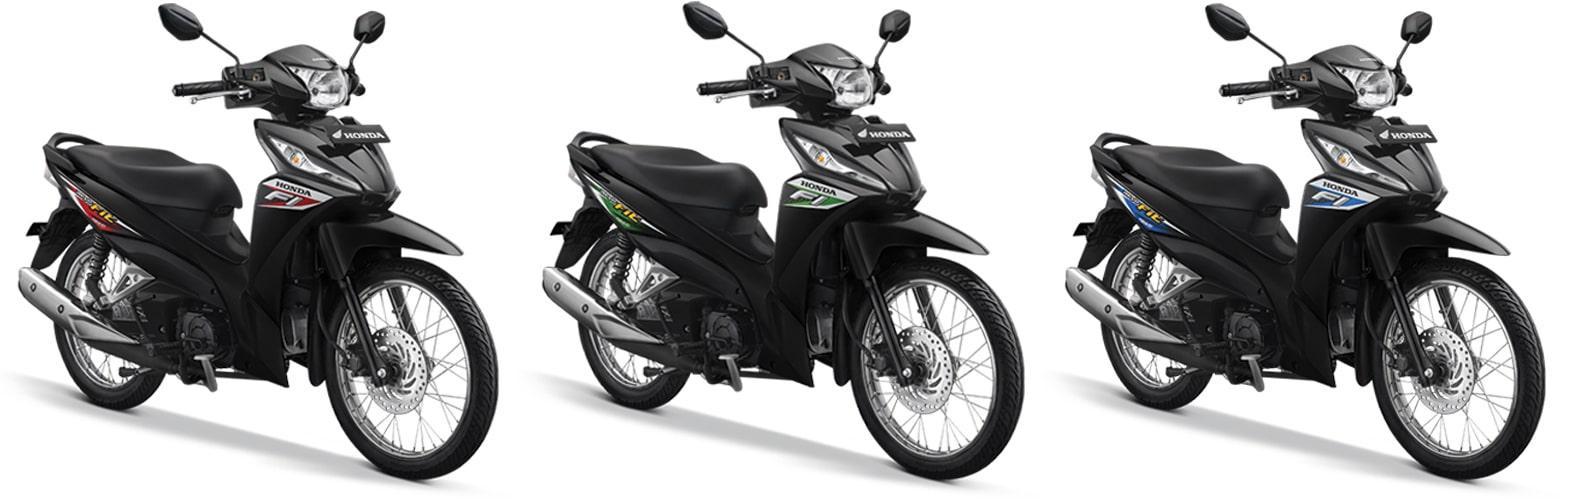 New Honda Revo Fit 2020